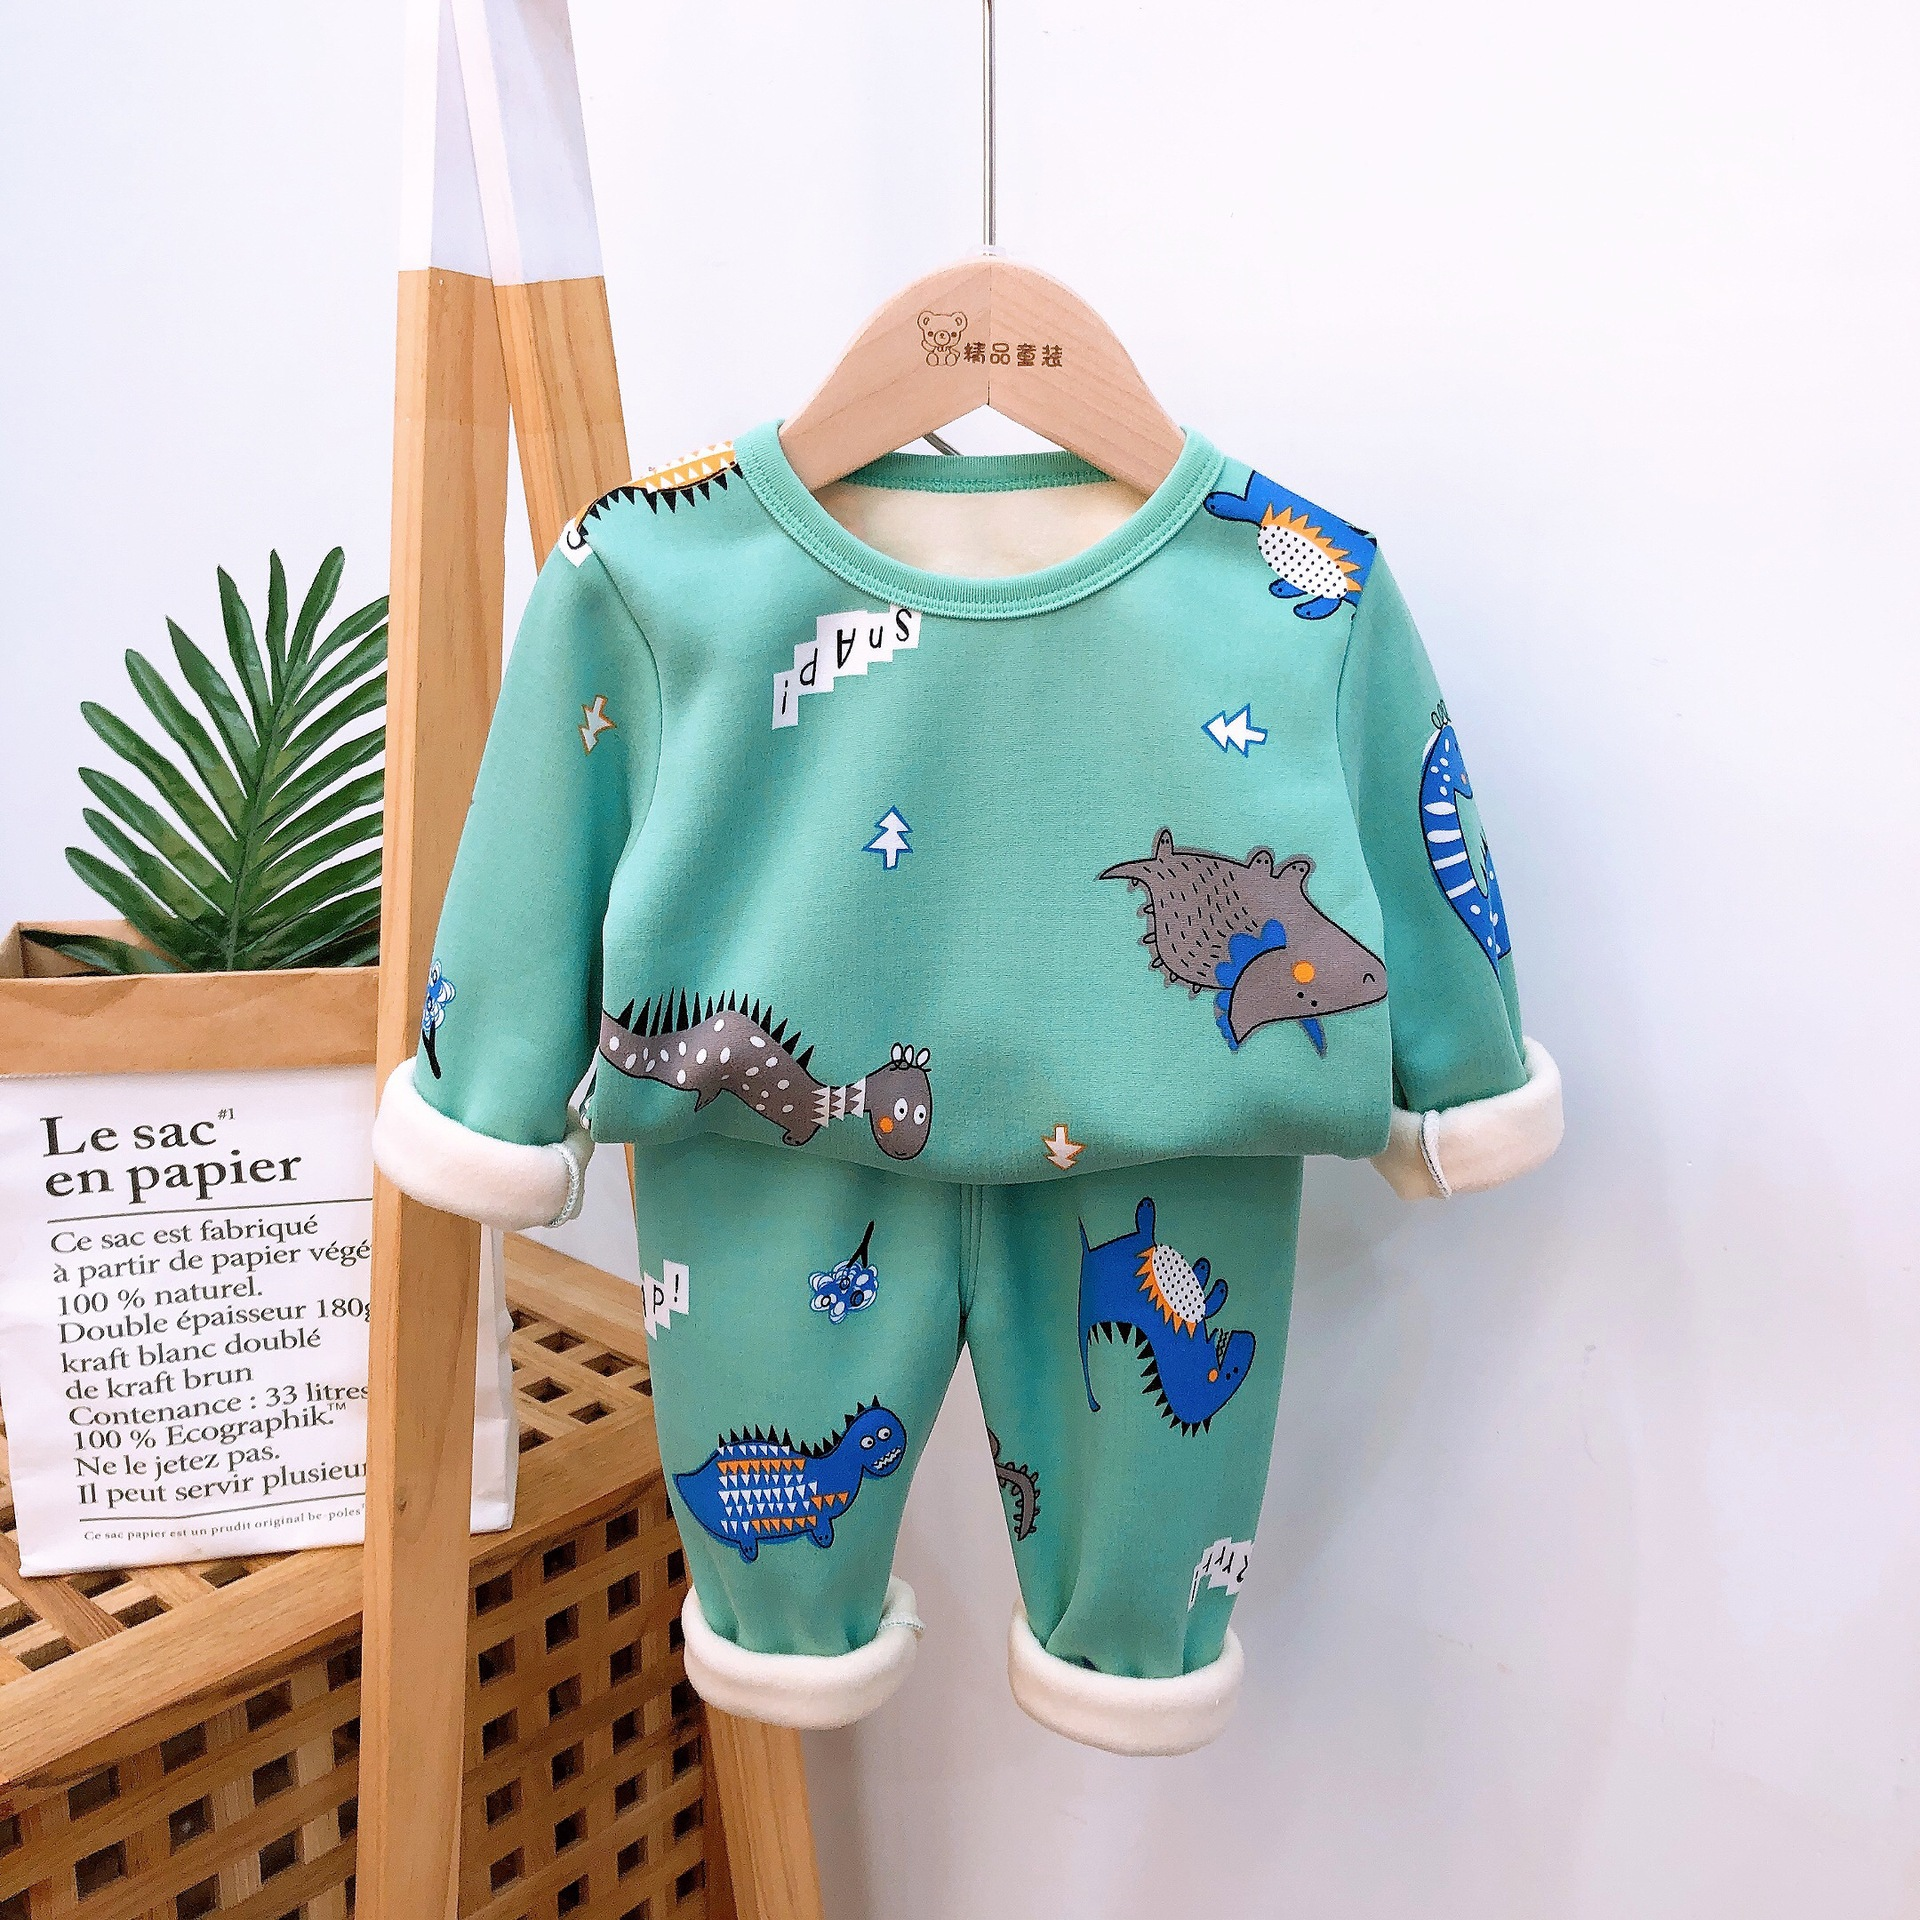 2021 Autumn Winter Thicken Velvet Children Pajamas Cartoon Family Boys Girls Clothing Set Kids Casual Sleepwear Suits Clothes 3